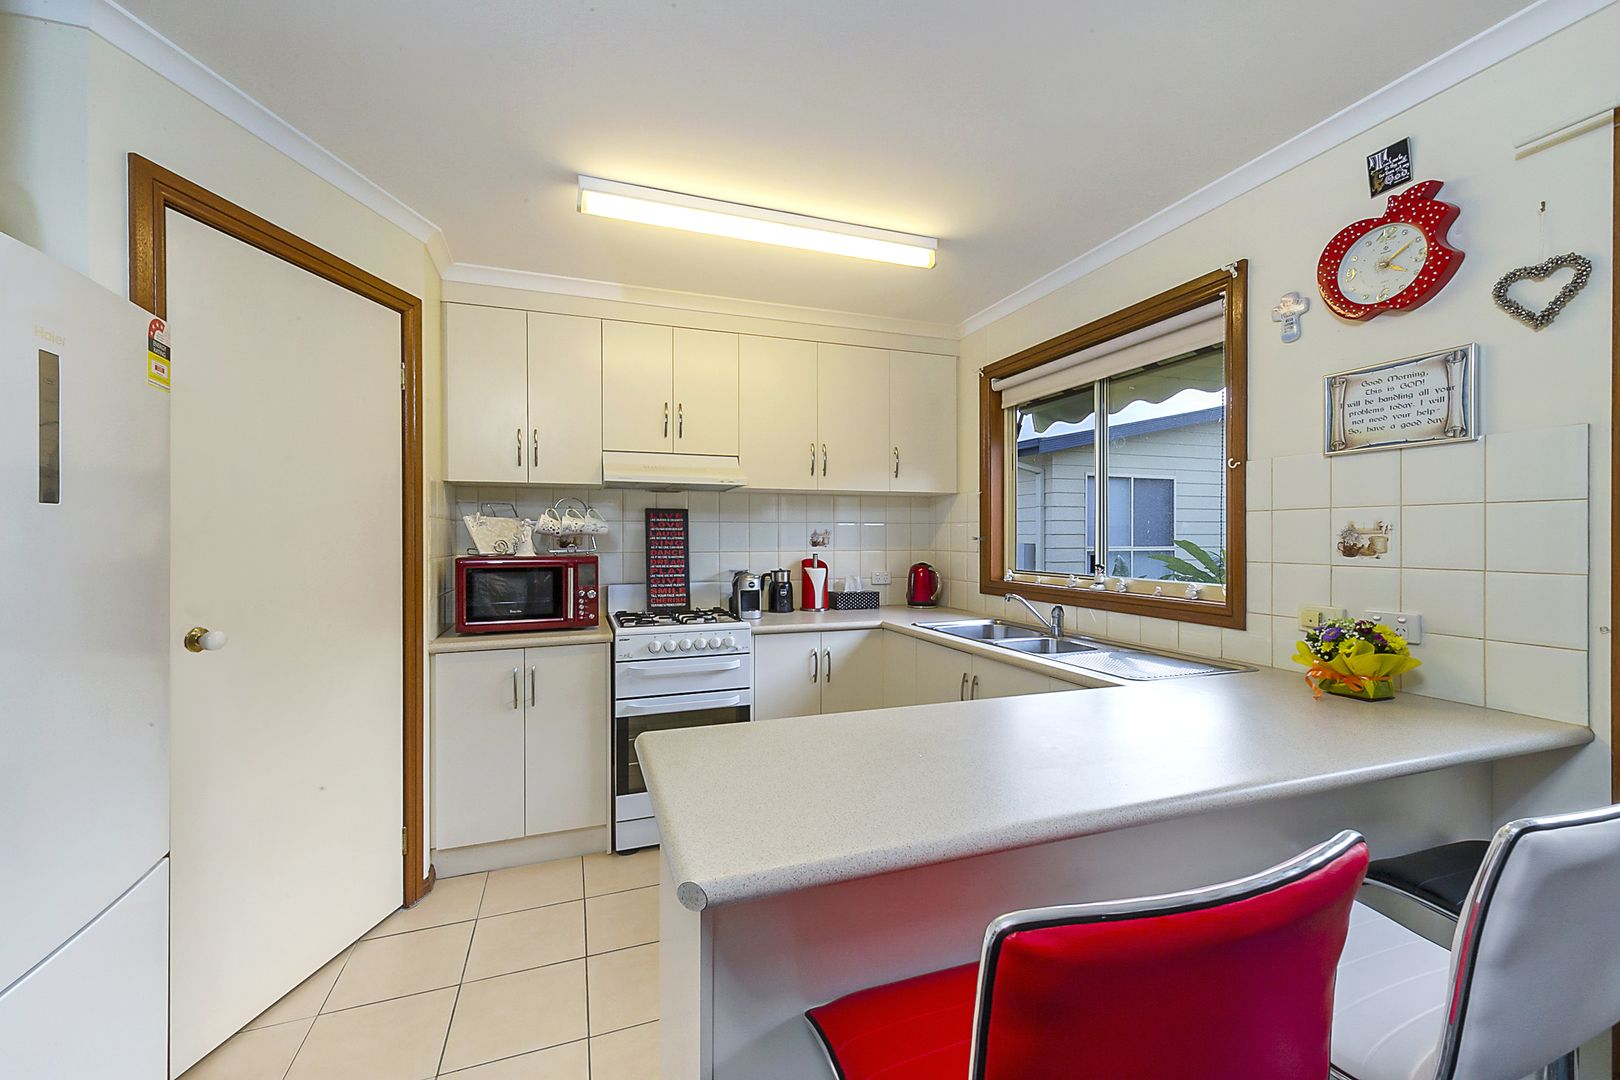 219/6-22 Tench Avenue, Jamisontown NSW 2750, Image 2